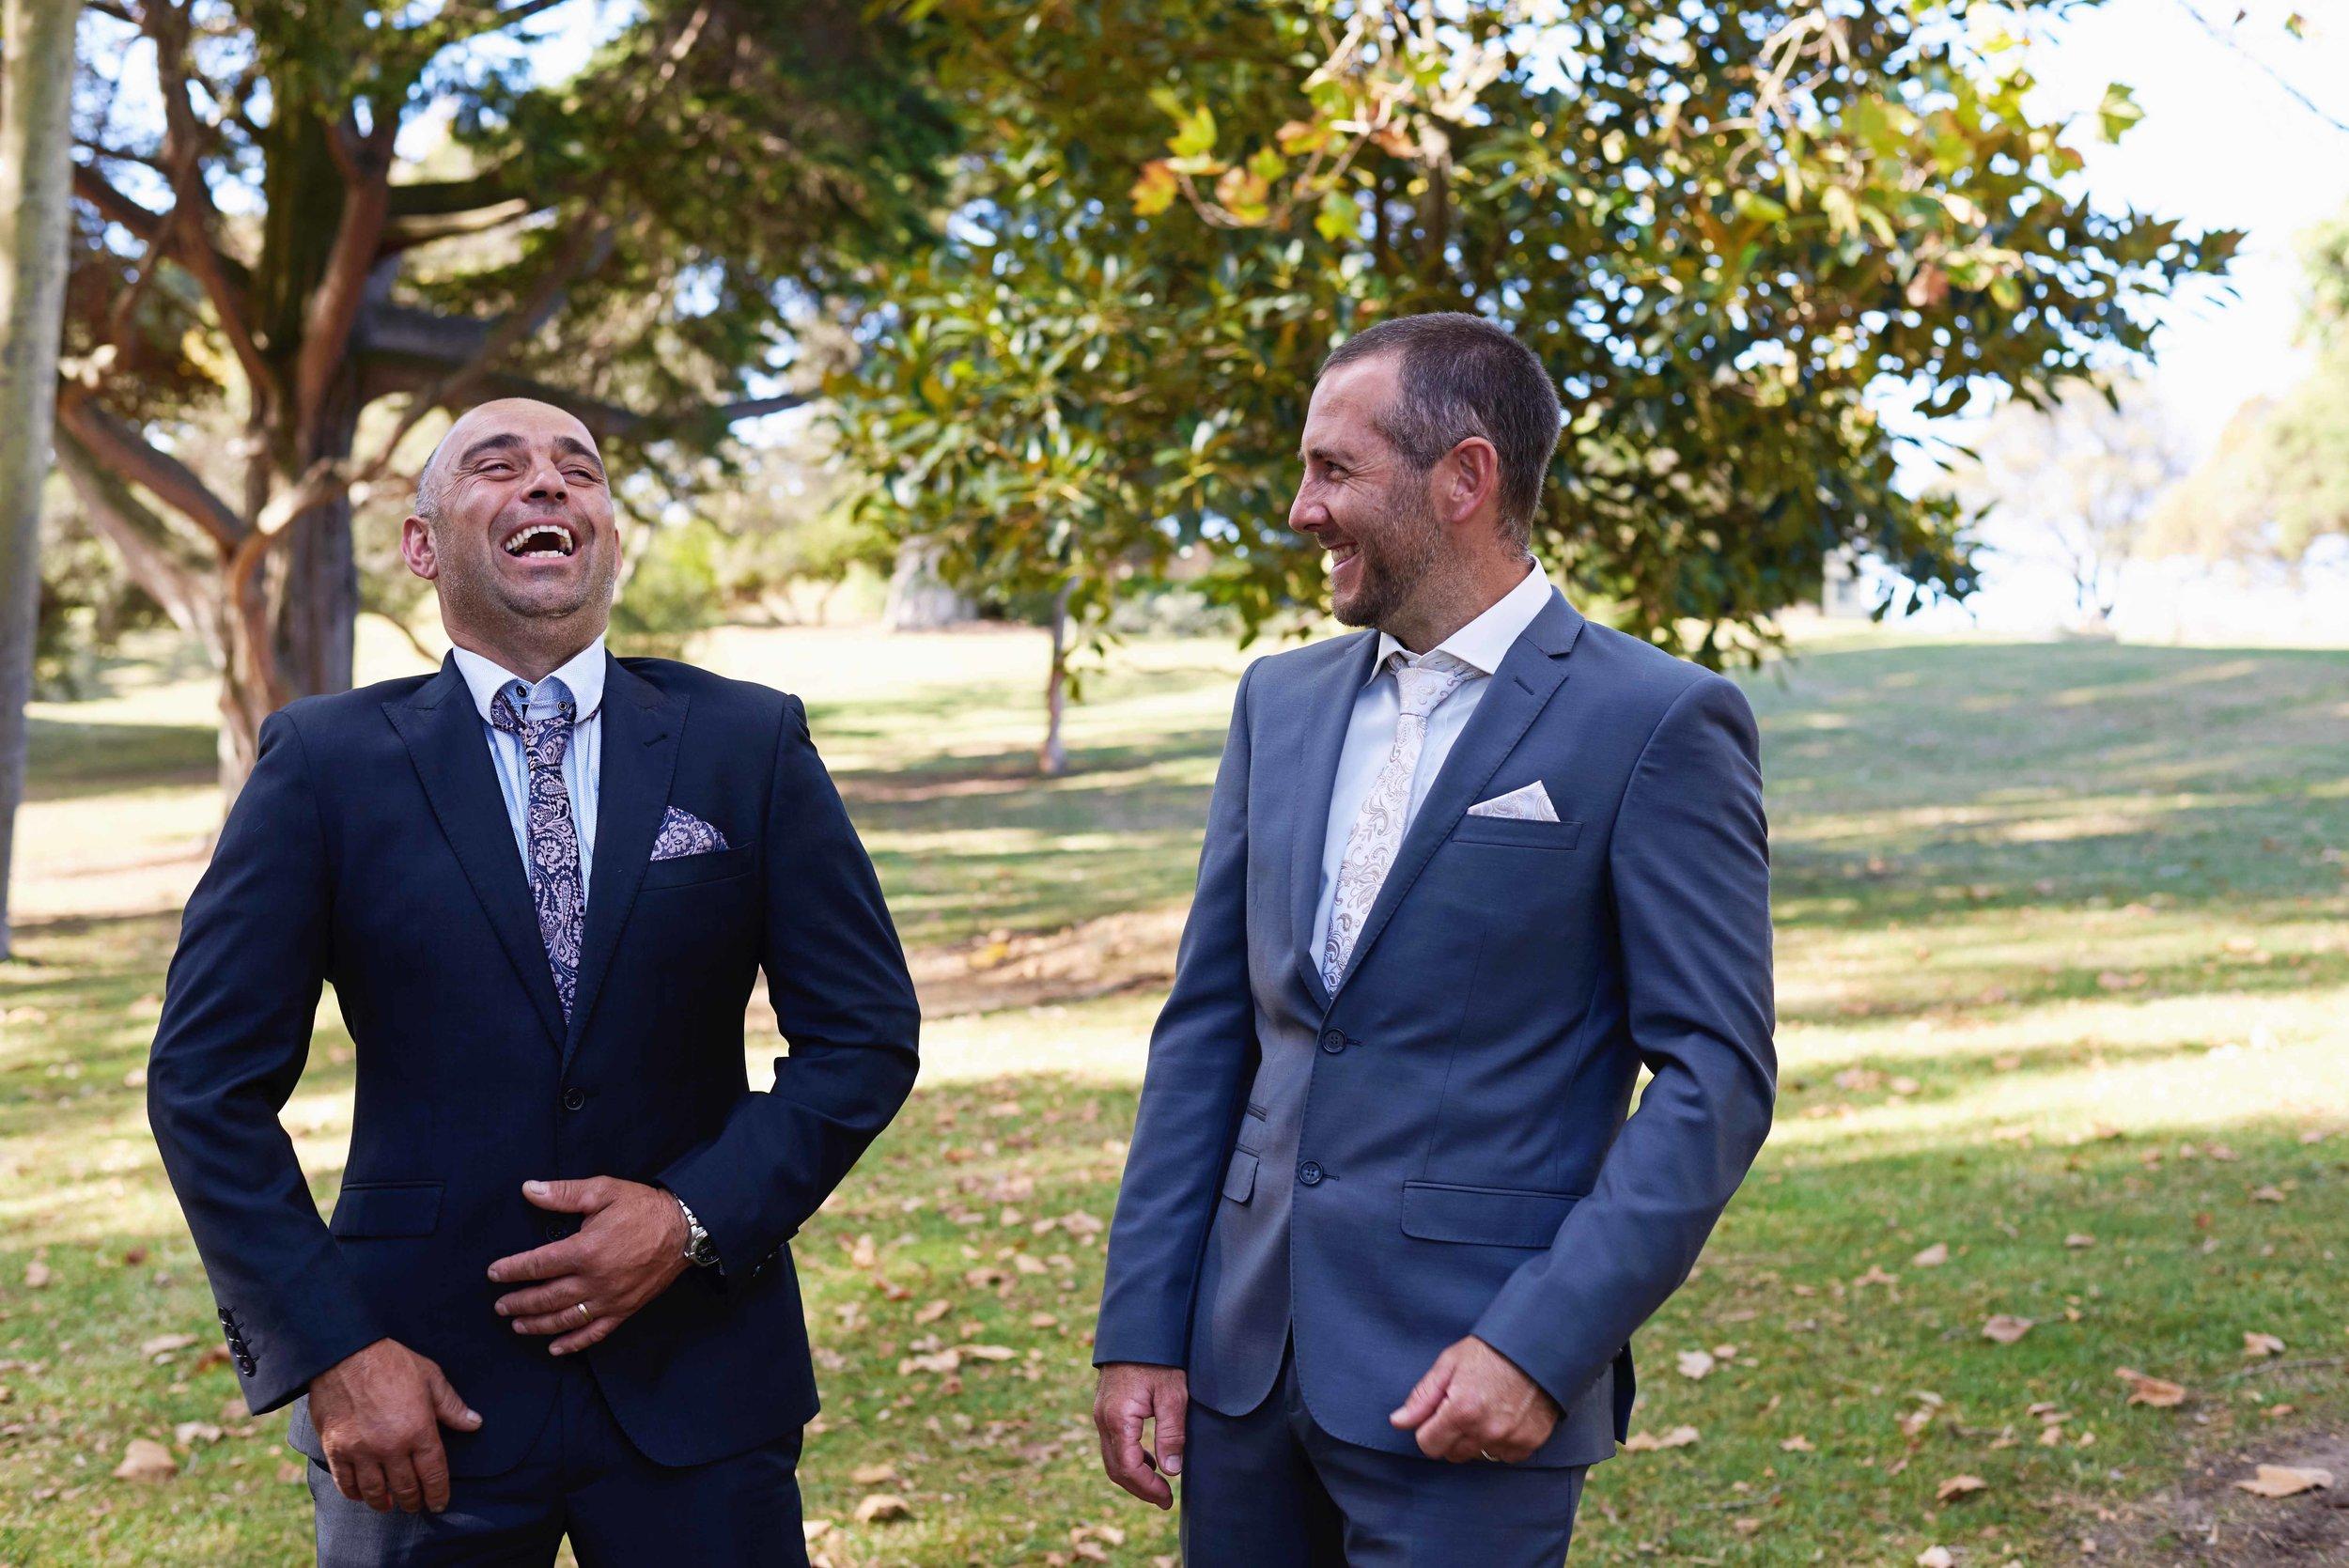 sorrento-wedding-photography-all-smiles-marissa-jade-photography-129.jpg